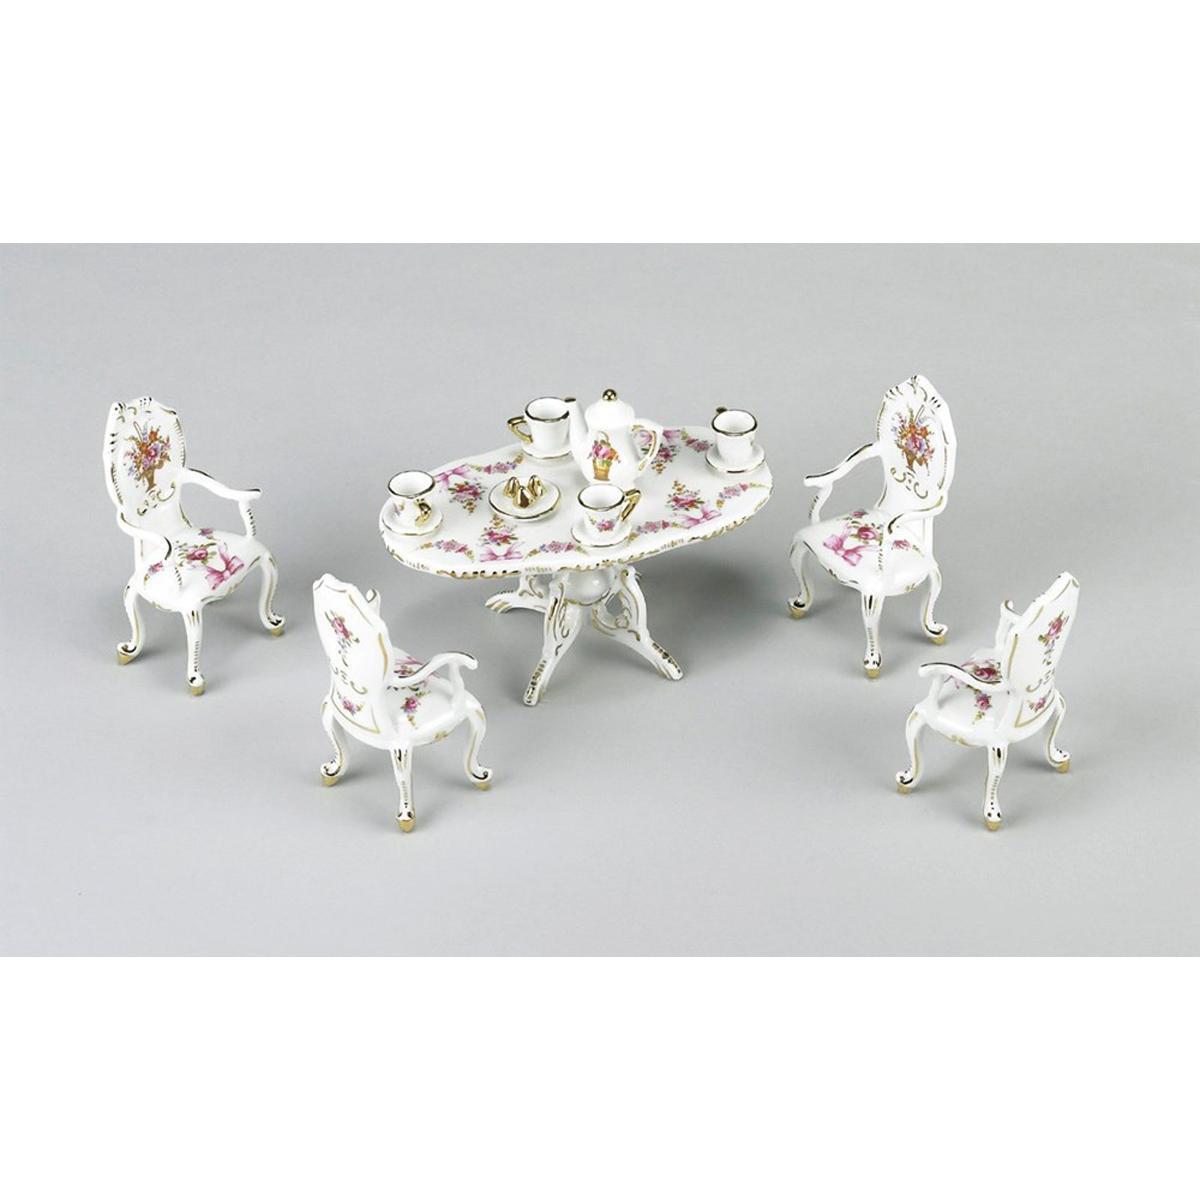 Miniature Table and Tea Set.